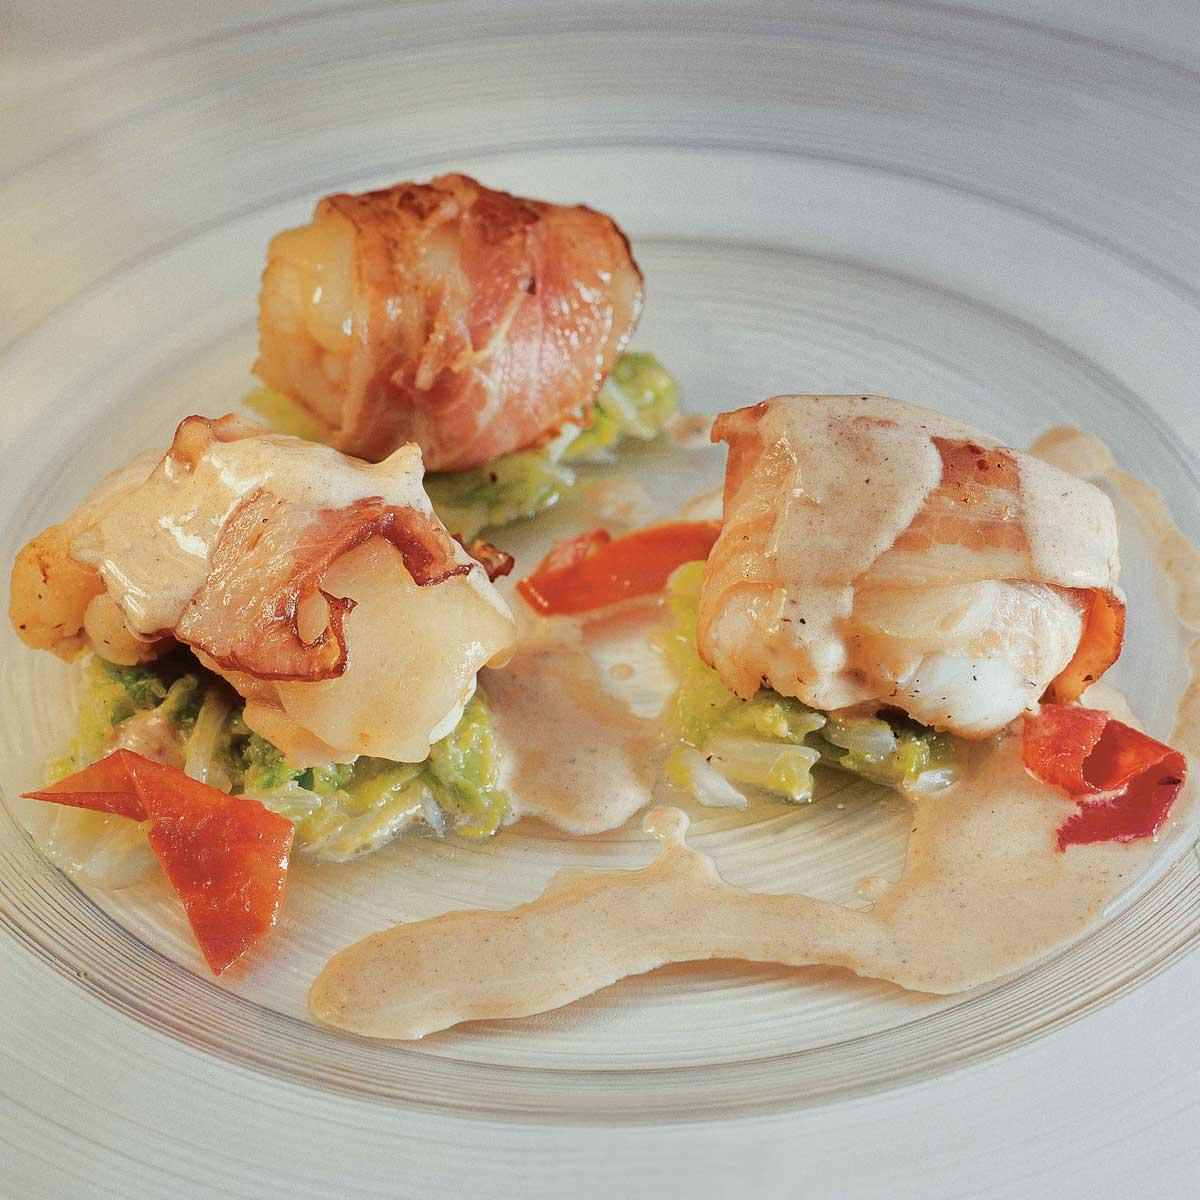 Recette lotte au lard et beaufort cuisine madame figaro - Lotte al armoricaine recette cuisine ...